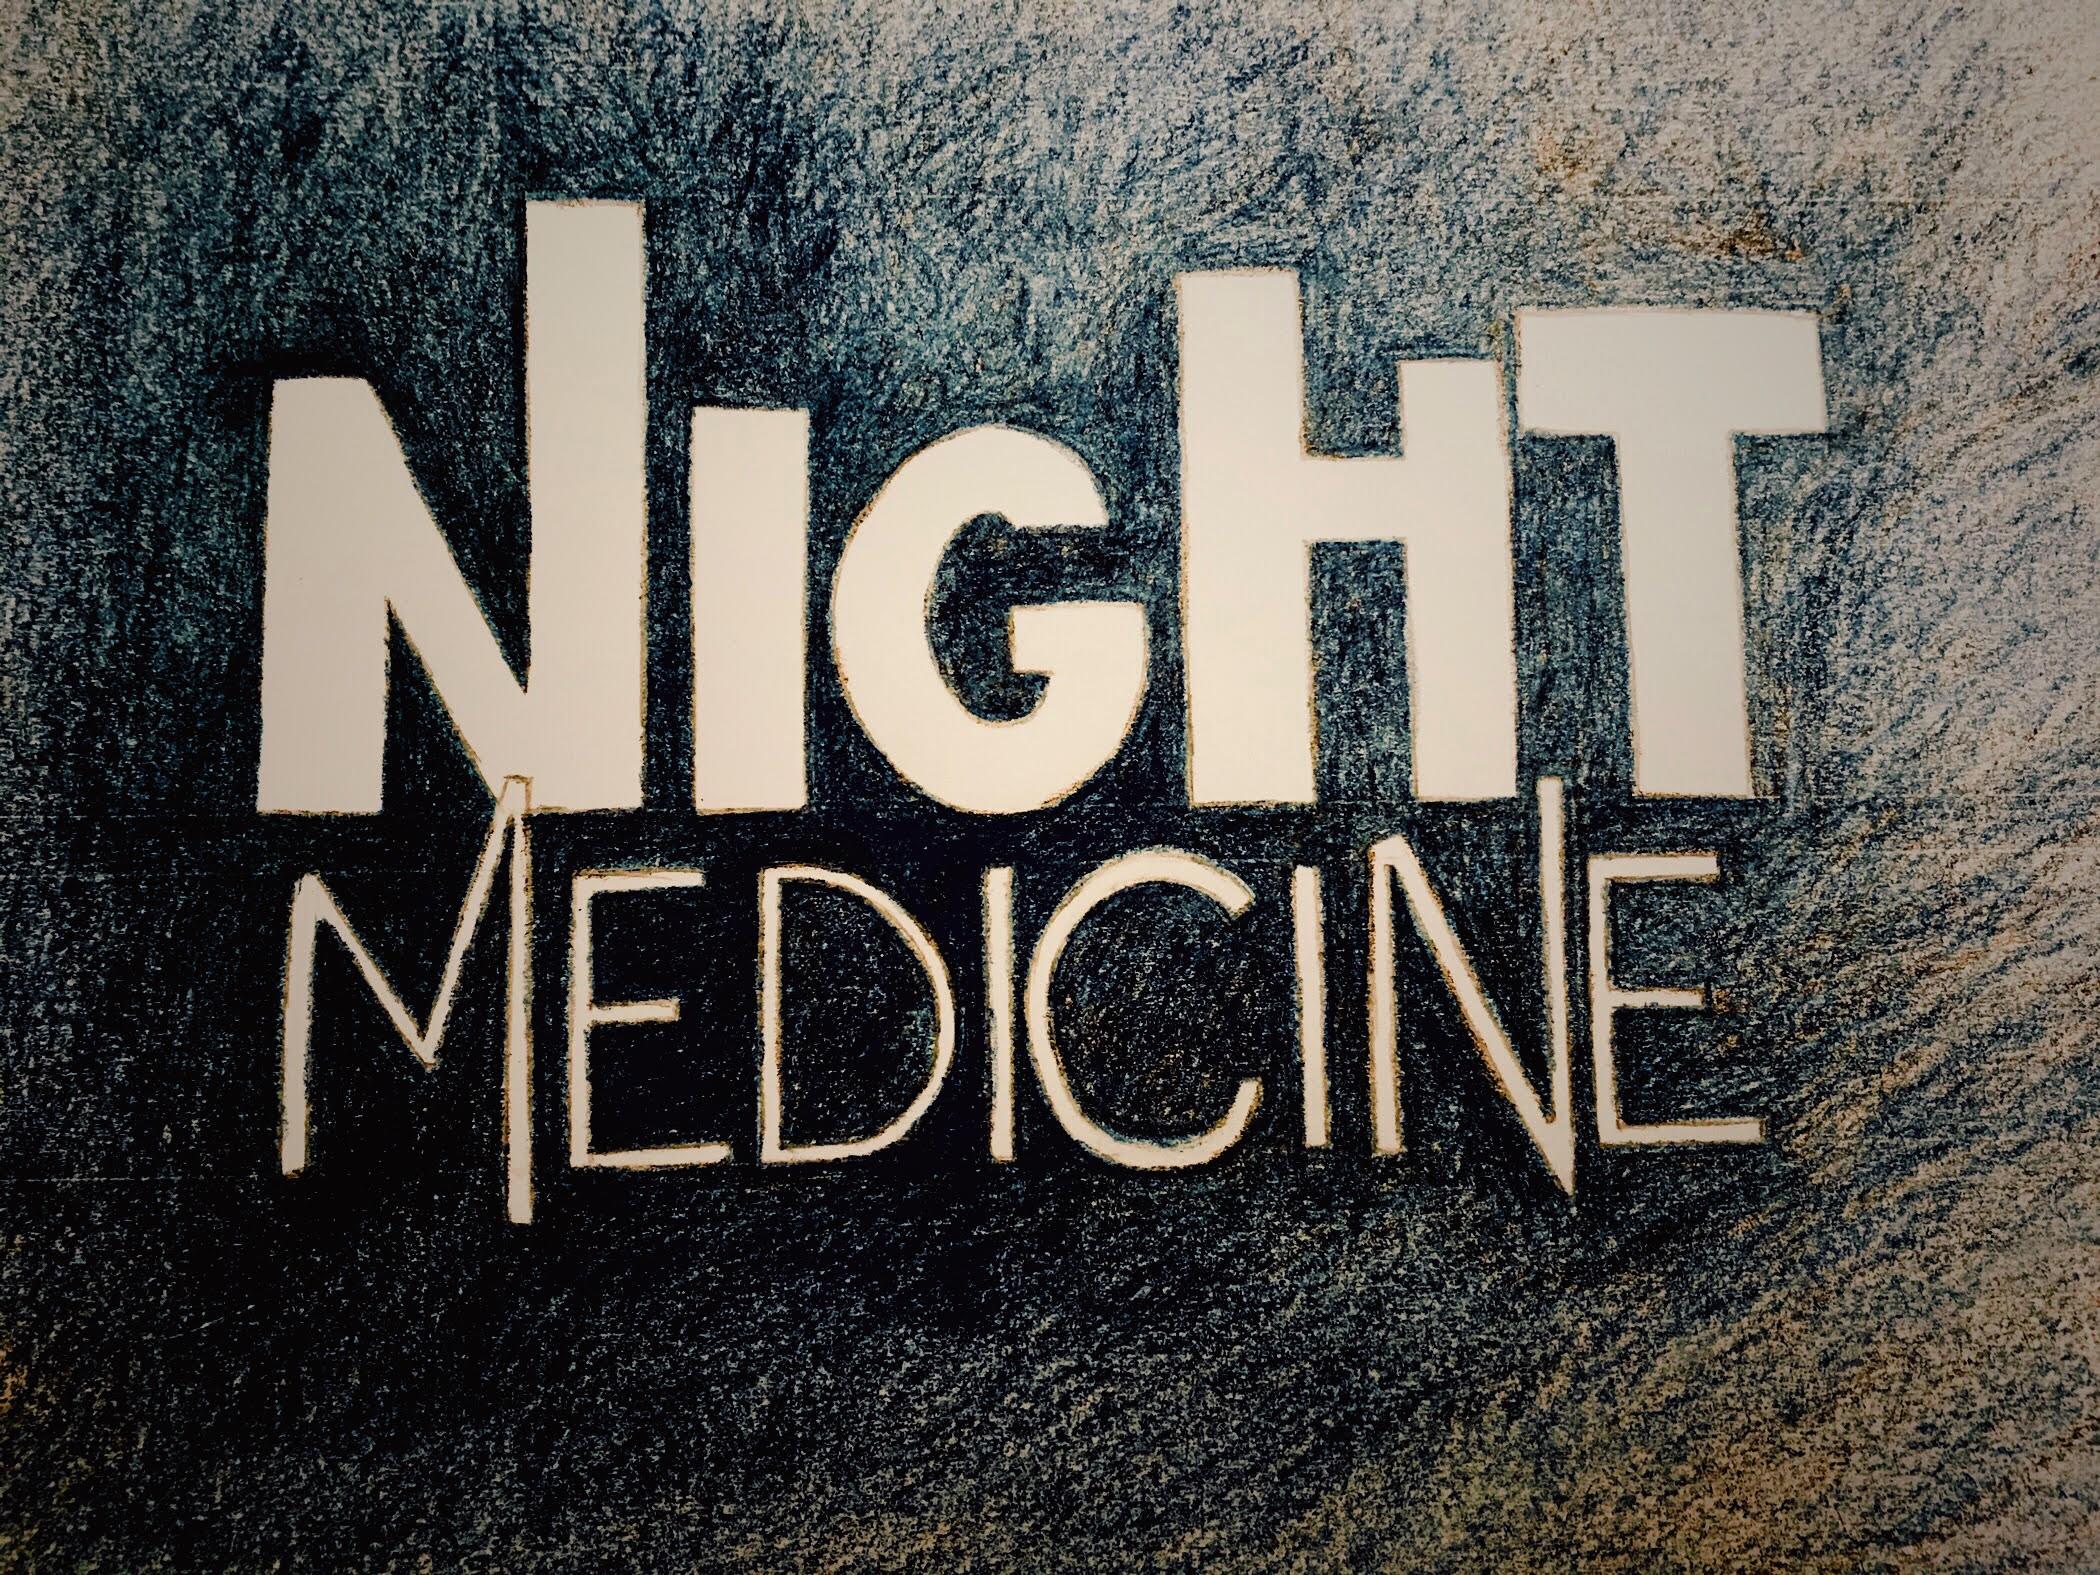 Night Medicine